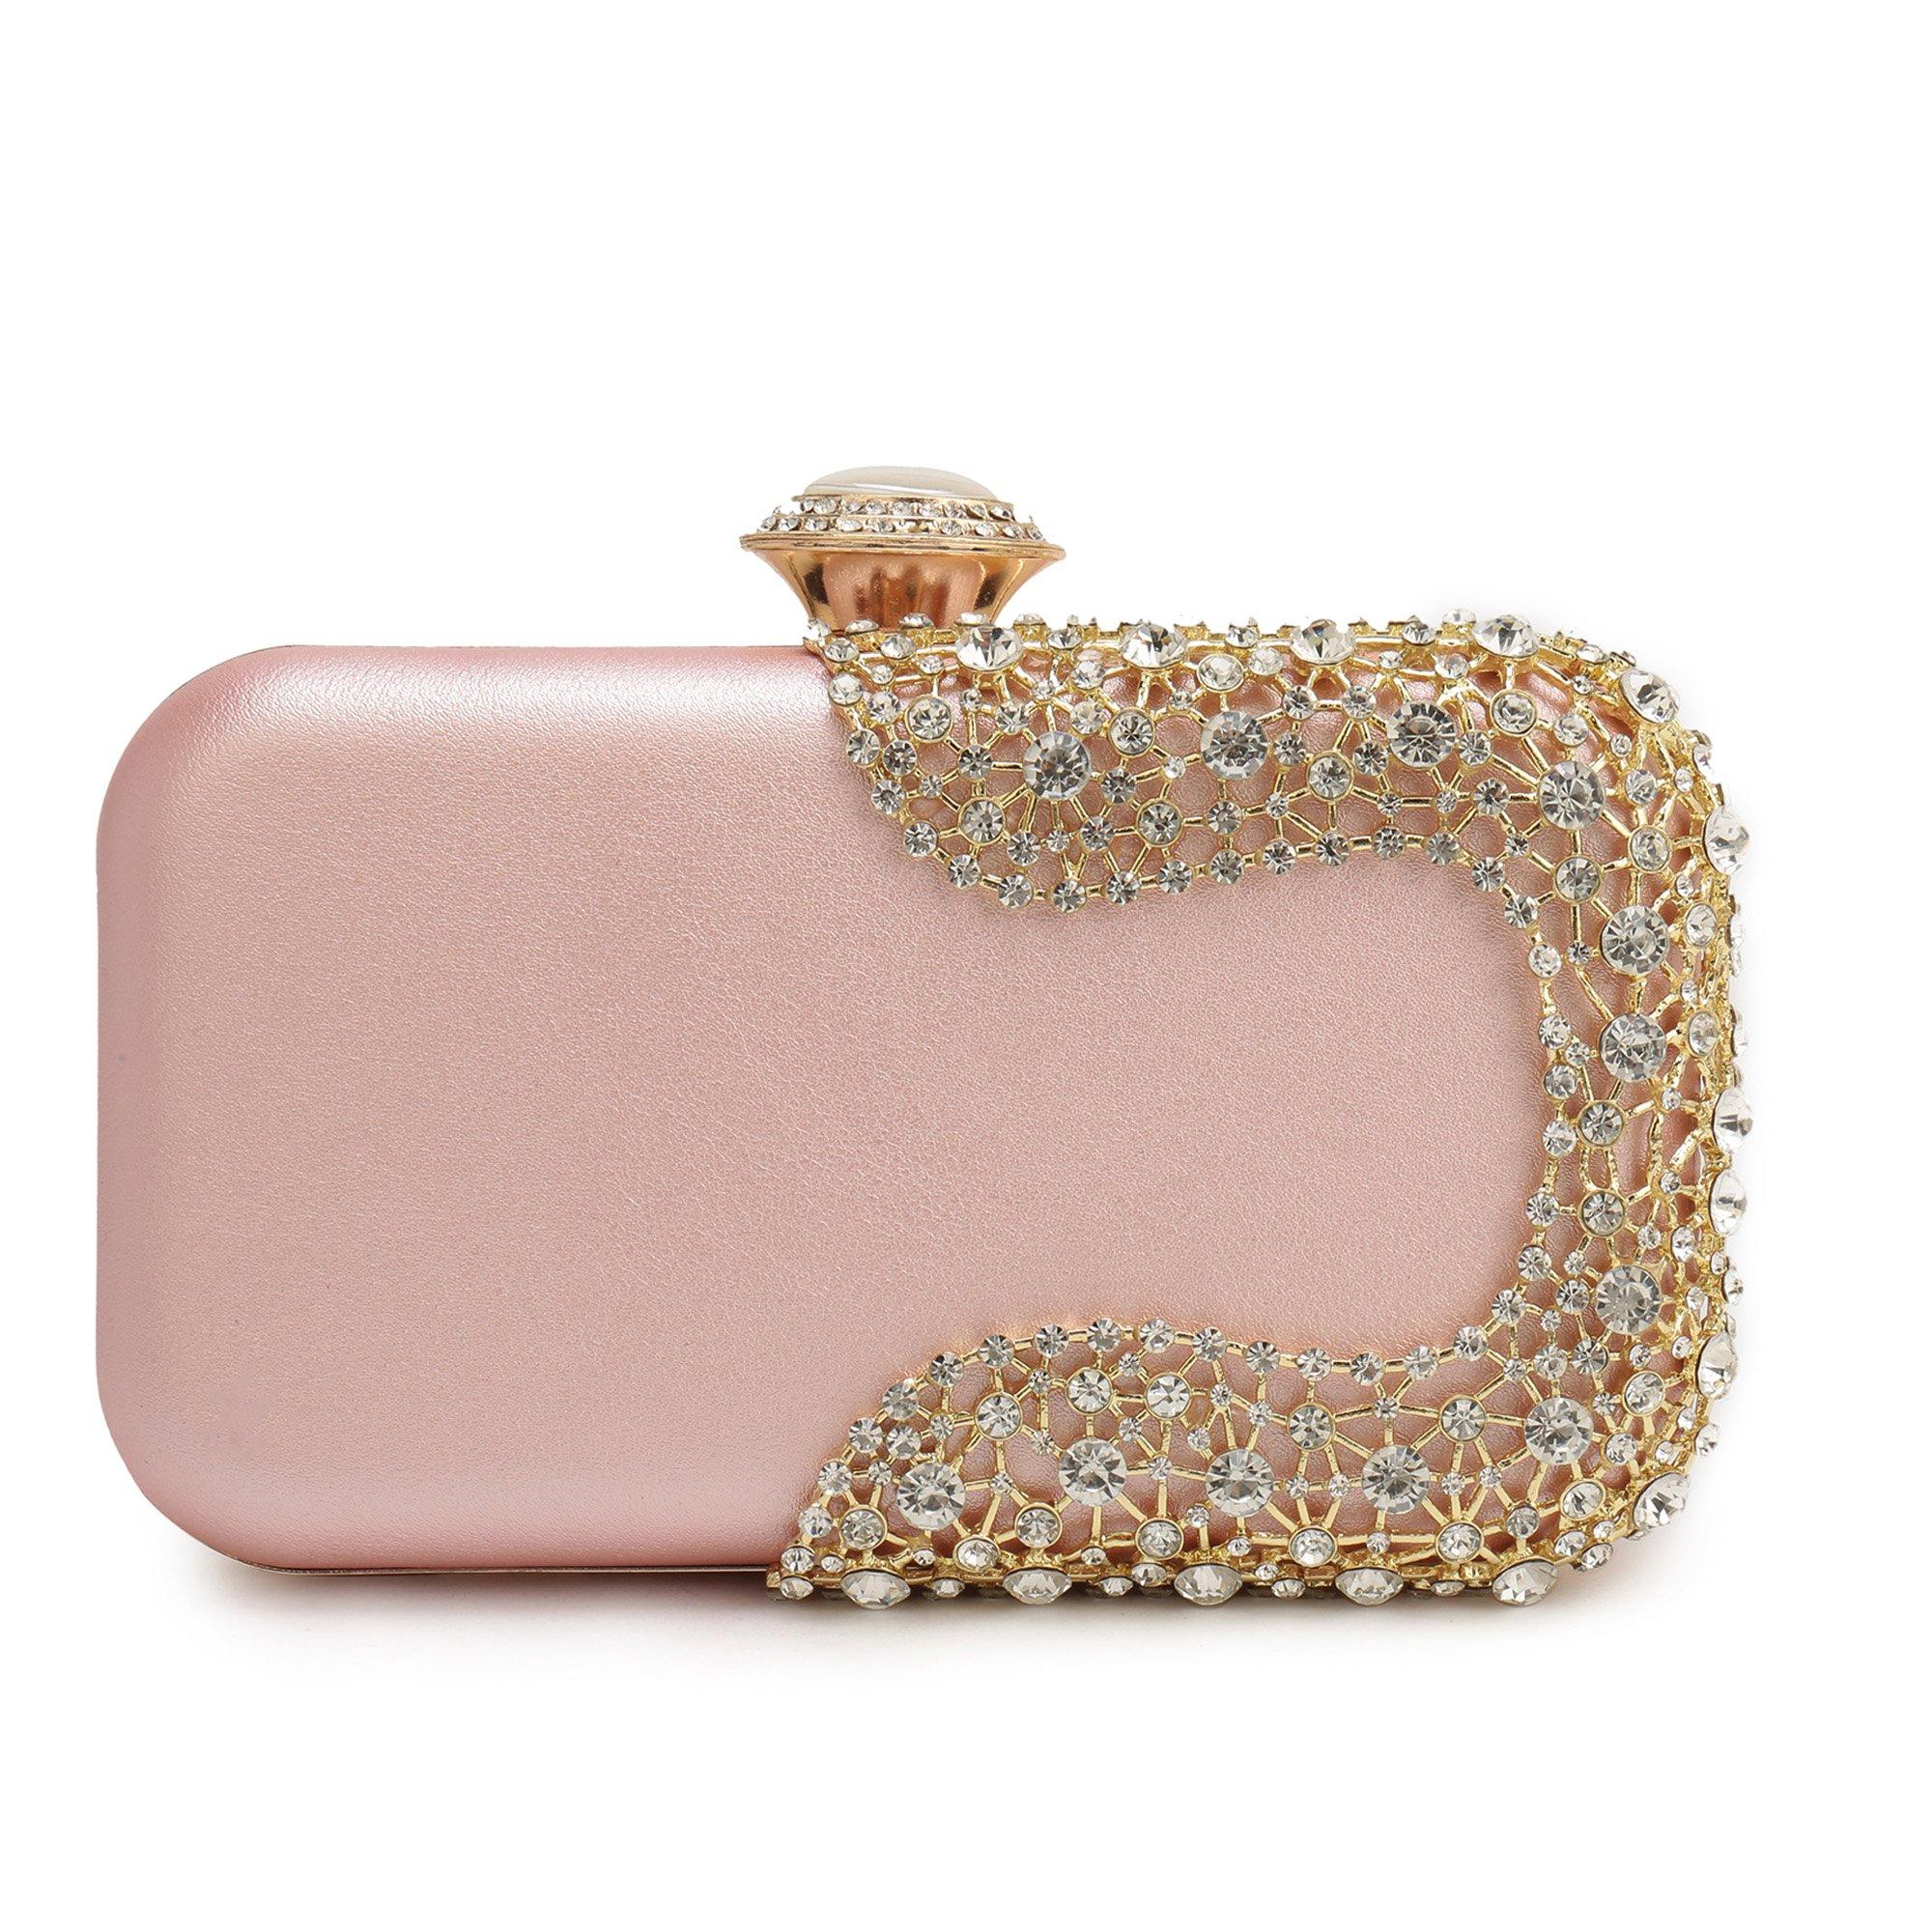 Gold Evening Clutch, Evening Bag Wedding Handbag Bridal Purses Cross Body Bag for Cocktail Prom